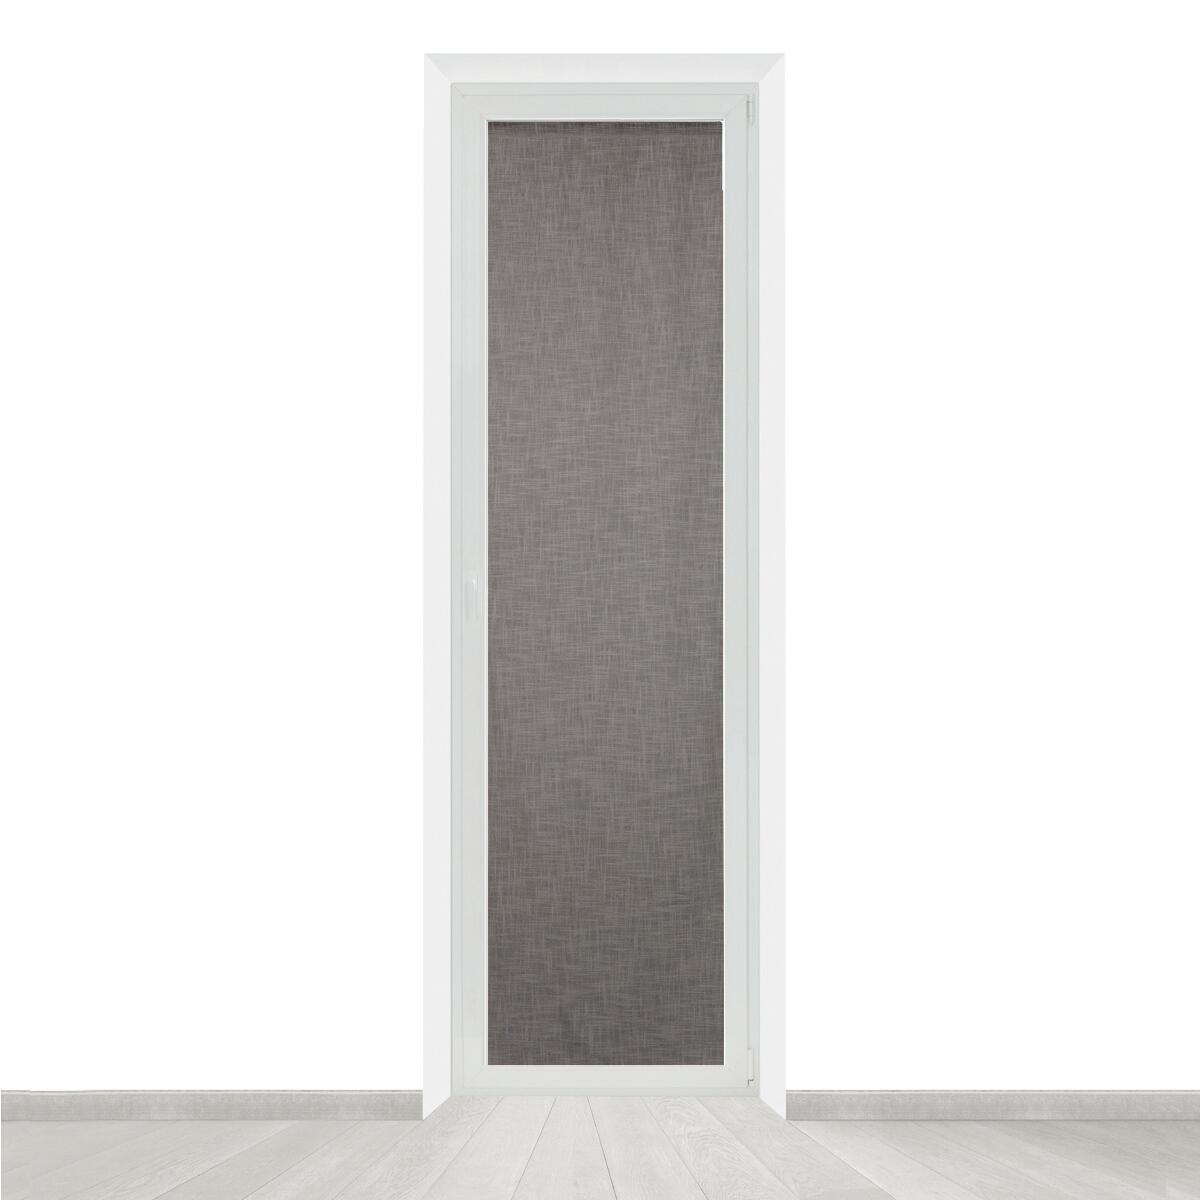 Tendina vetro Infini grigio tunnel 60 x 240 cm - 2